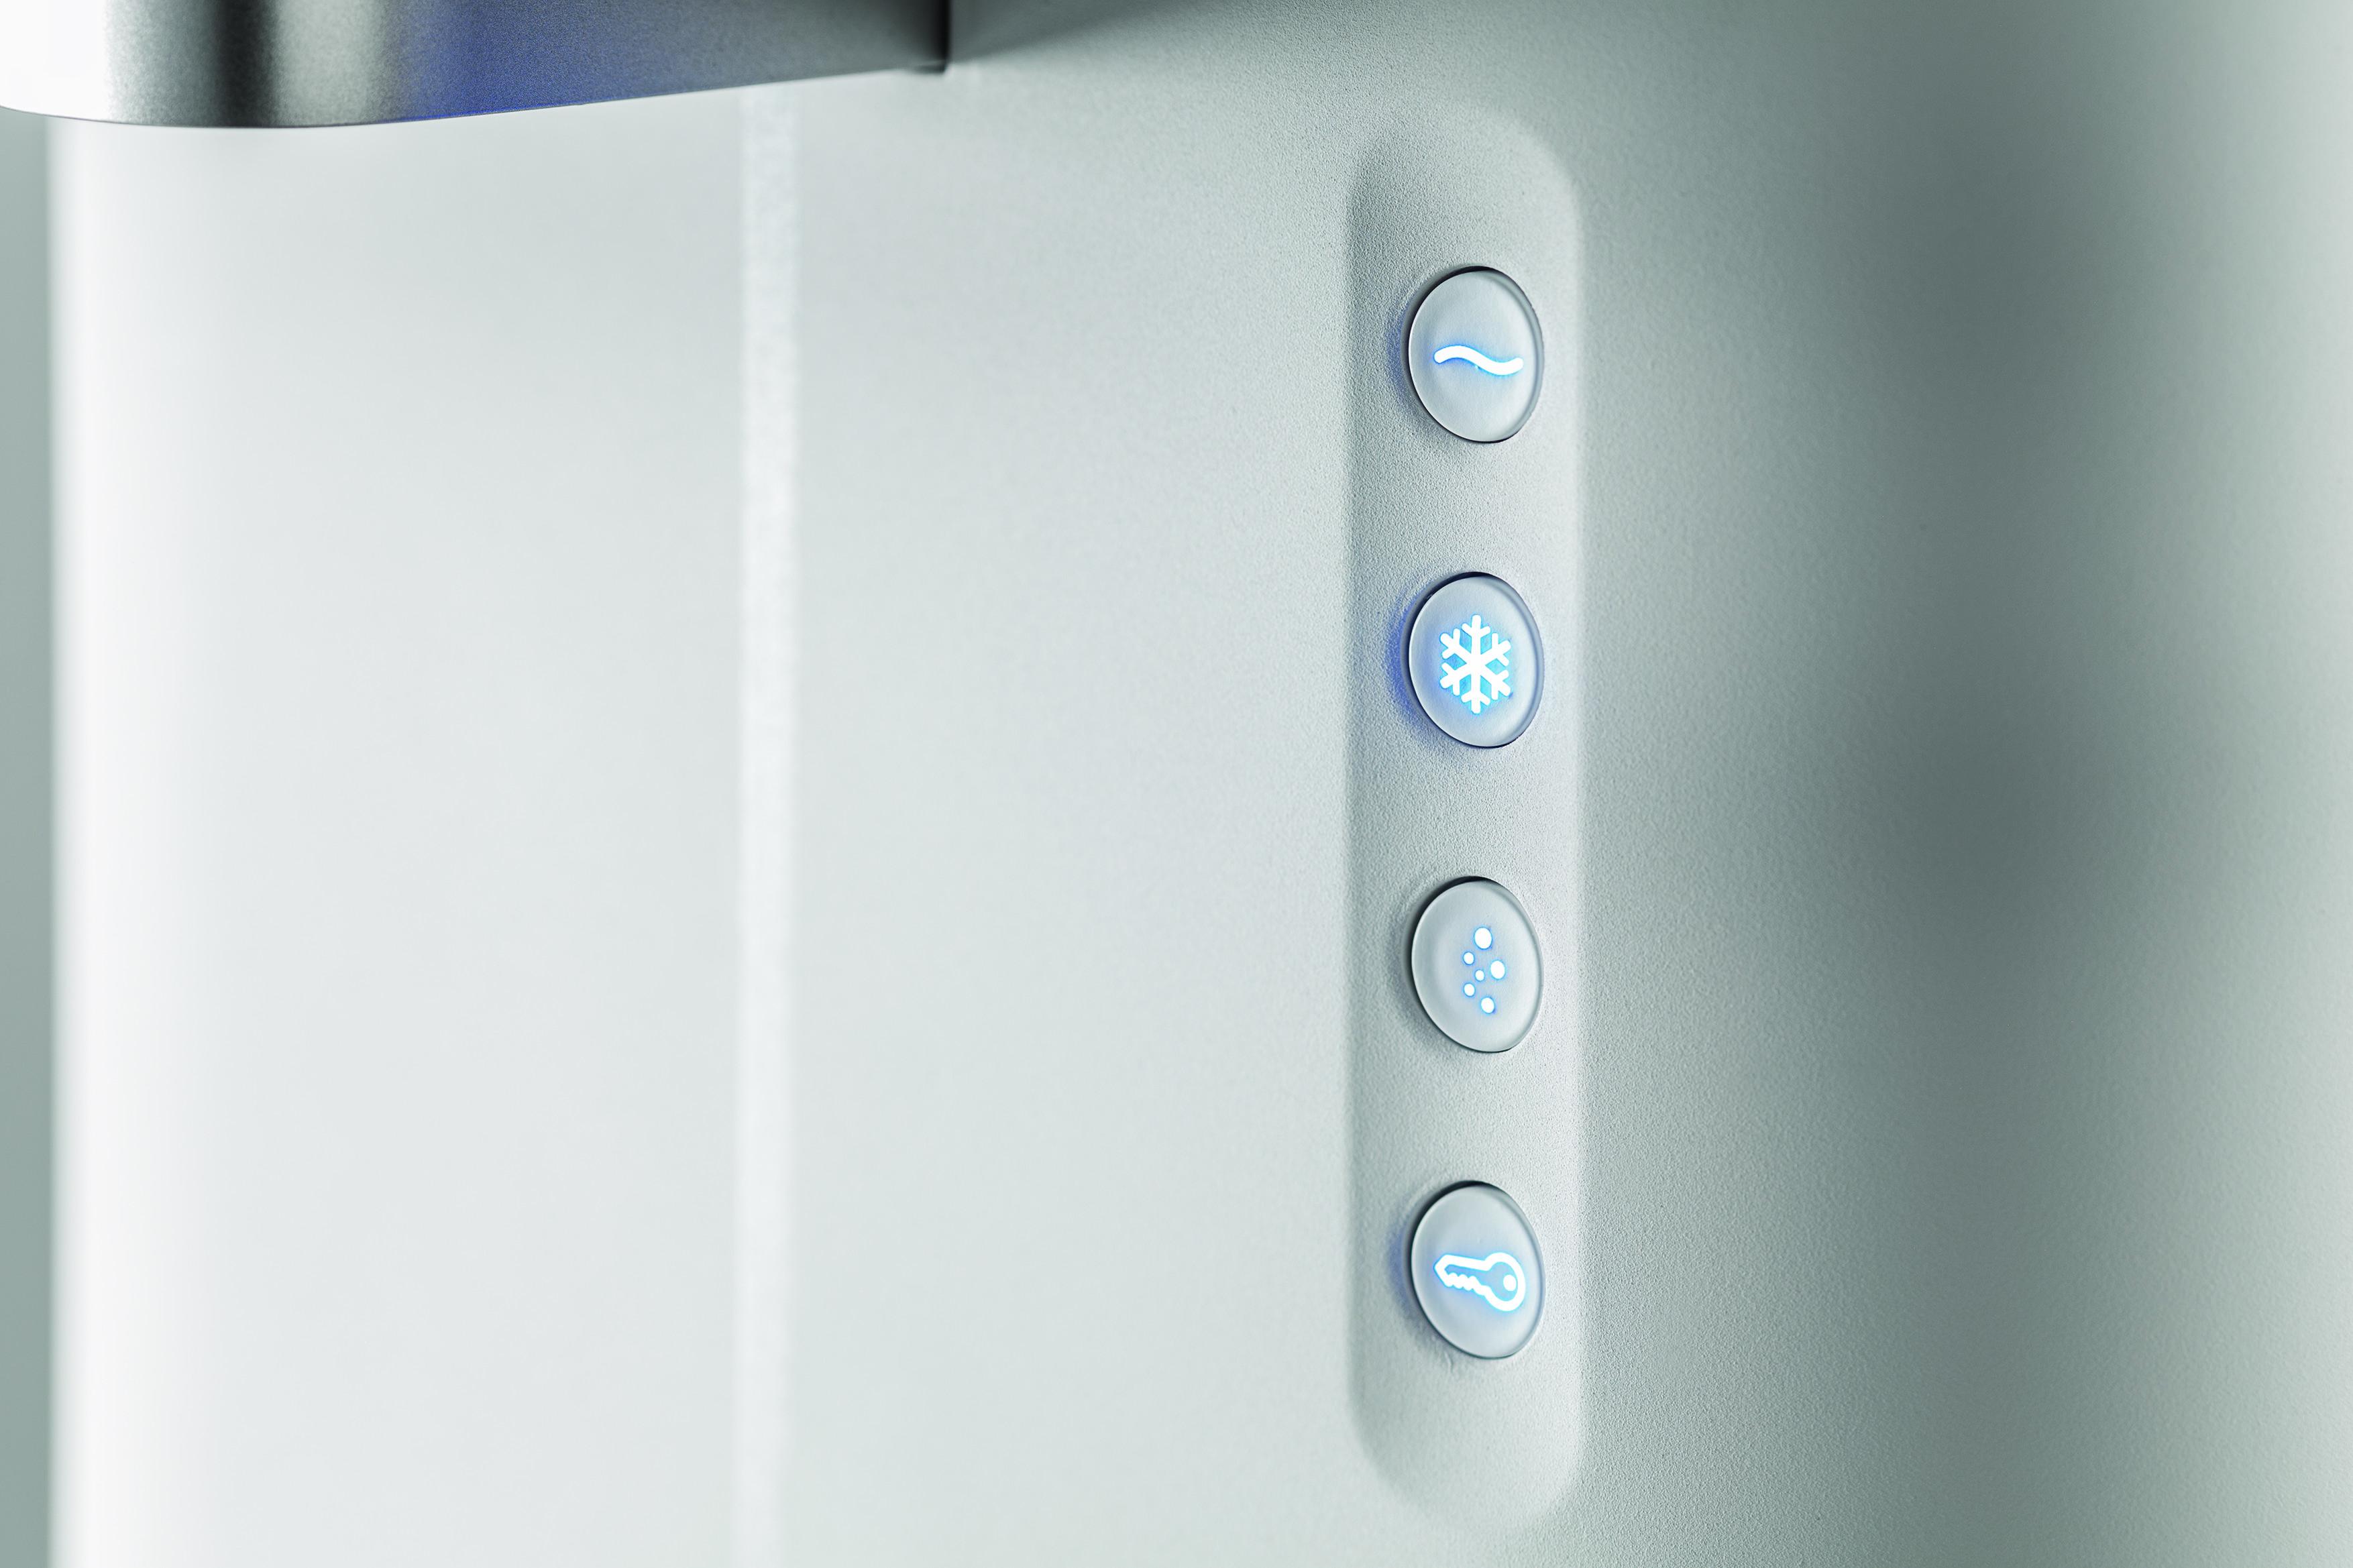 Ersatzteil: Pro Top control-buttons-SP yource